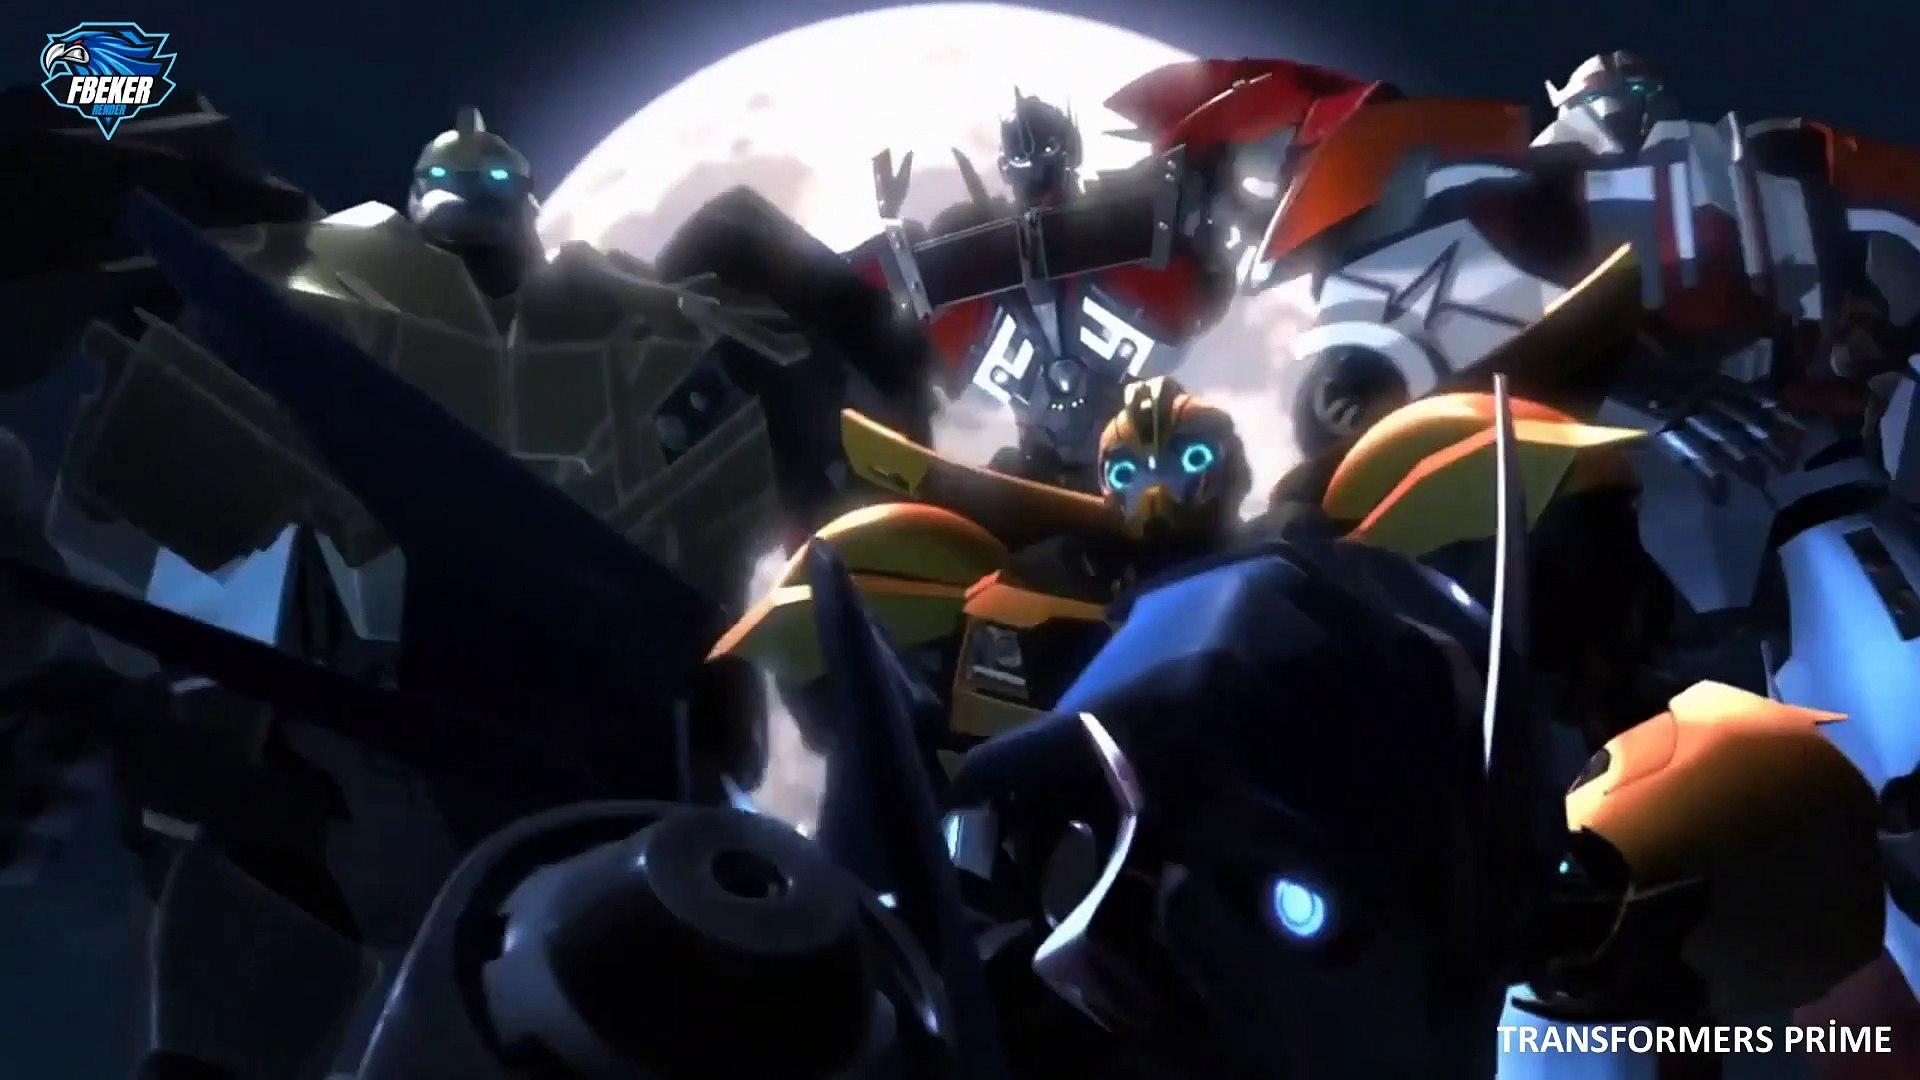 Transformers Prime 31.Bölüm Operasyon Bumblebee Kısım 2 Full Hd